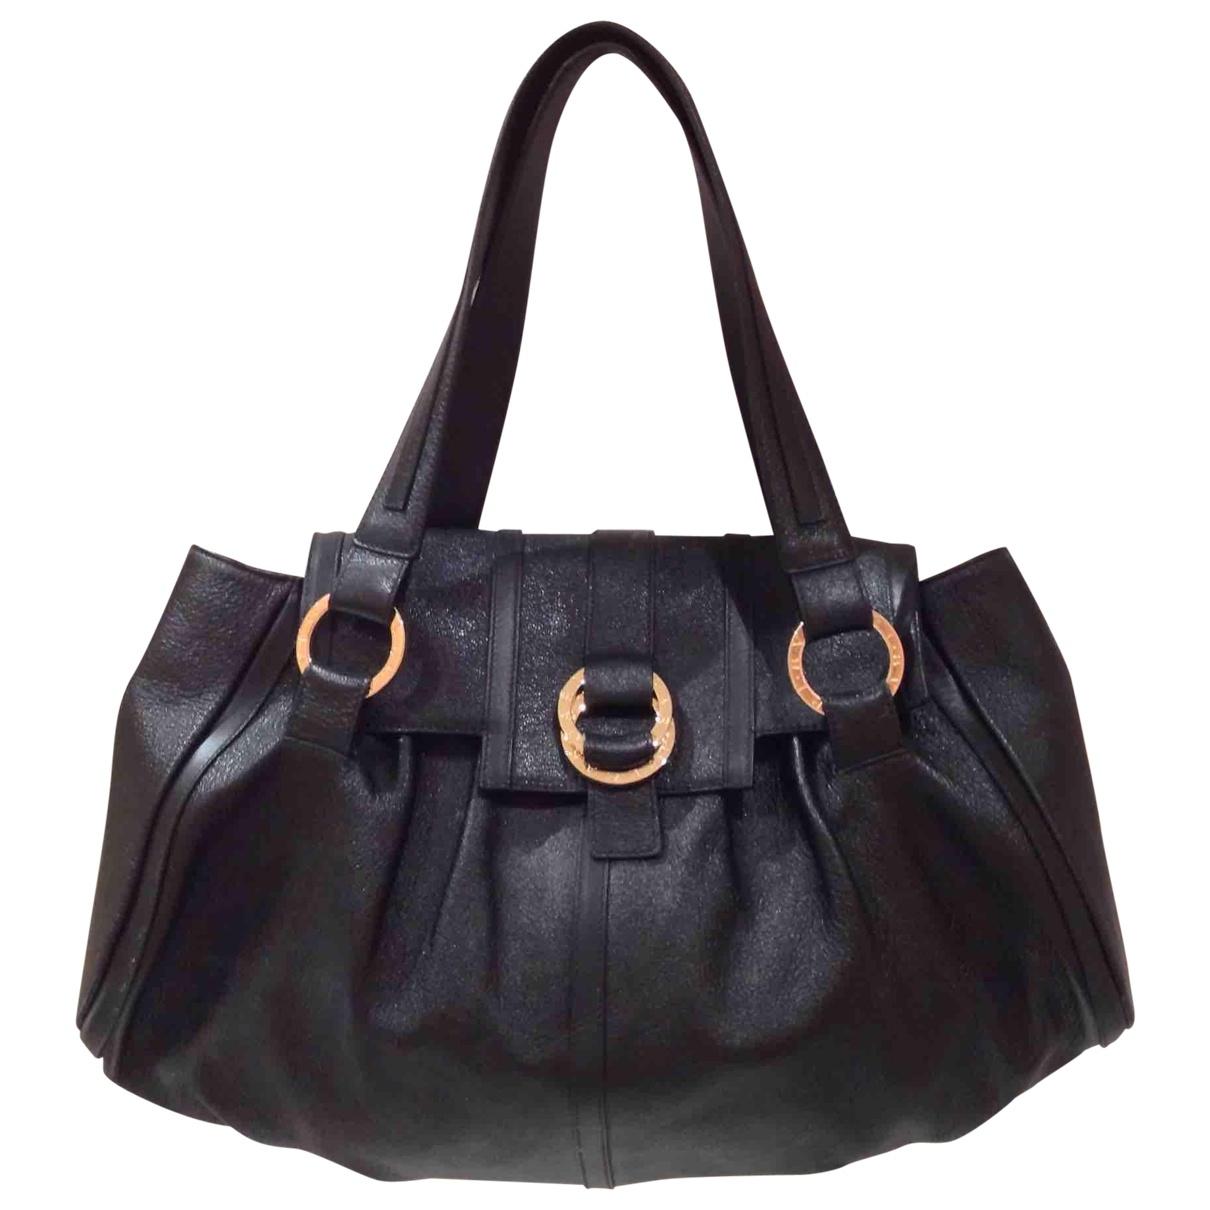 Bvlgari \N Black Leather handbag for Women \N